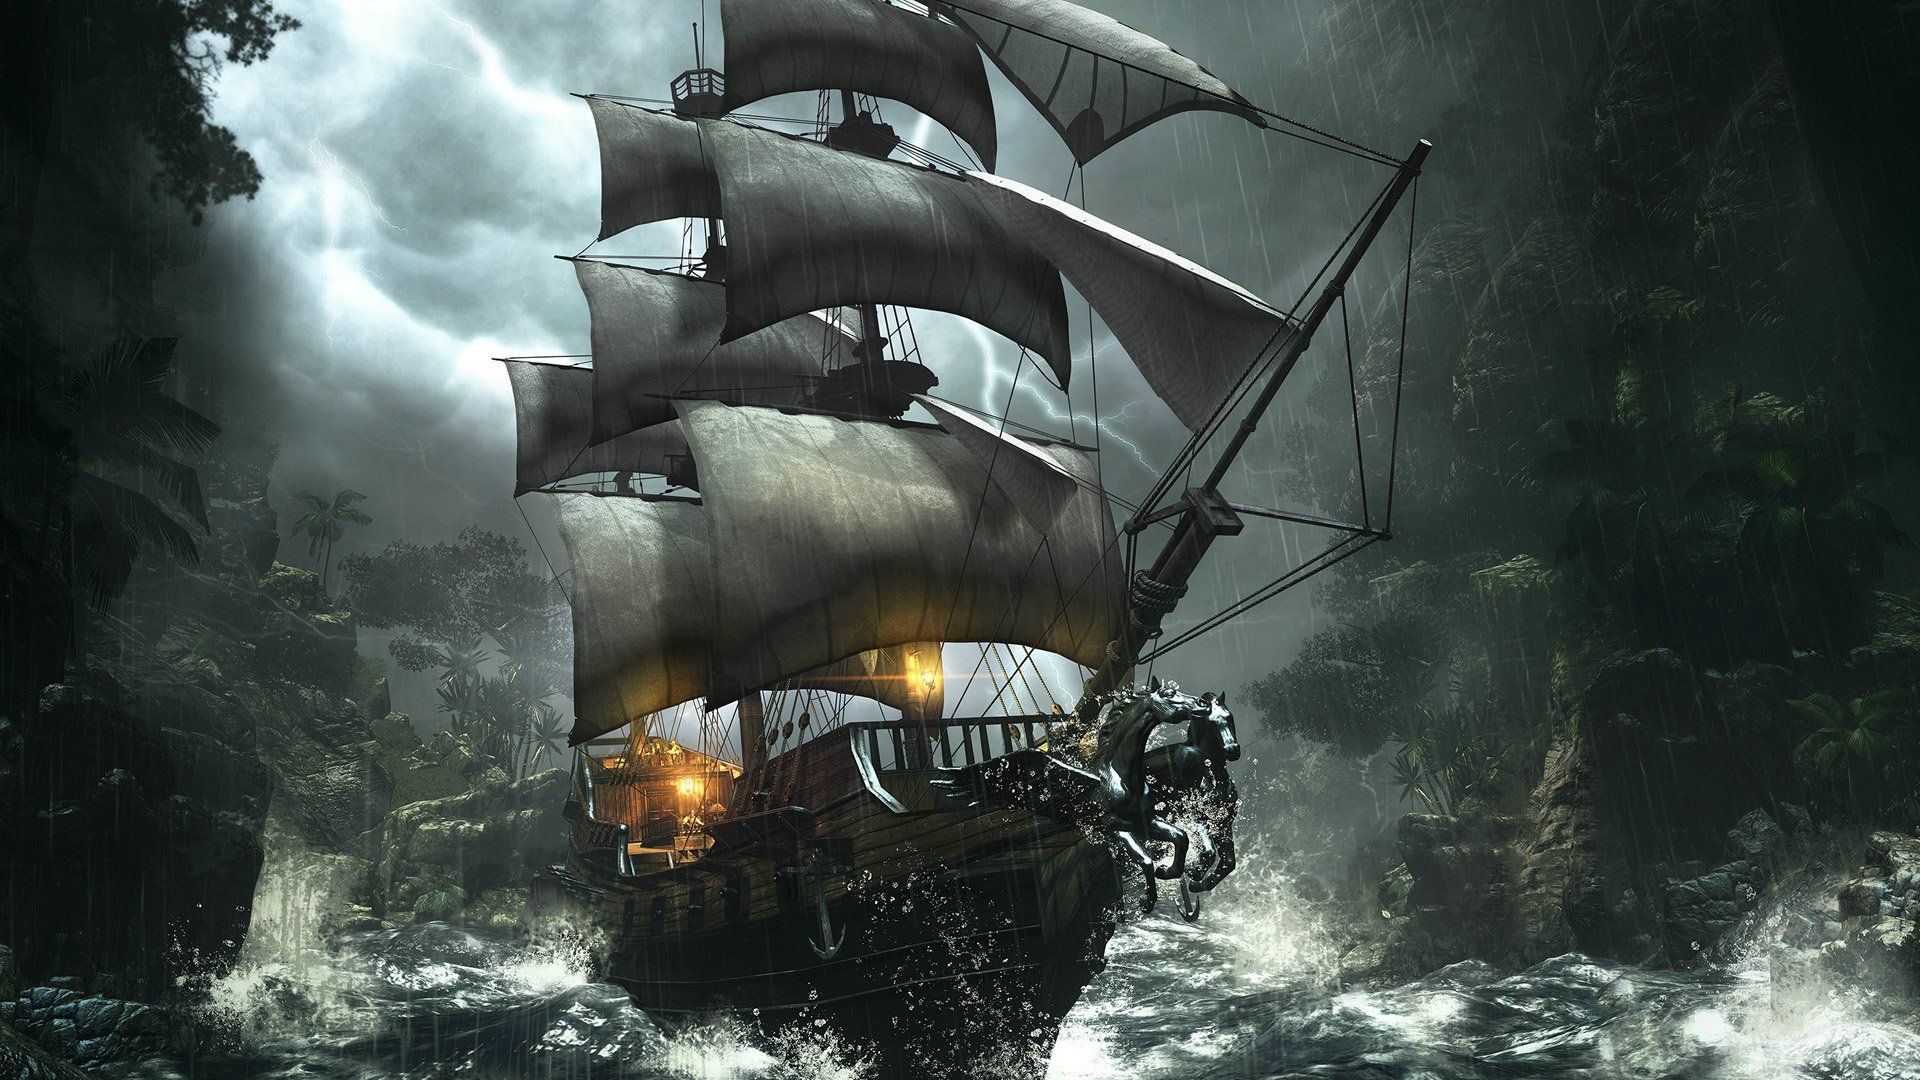 Pirate Ship Wallpaper High Definition 02c20 1920x1080 px 42015 1920x1080